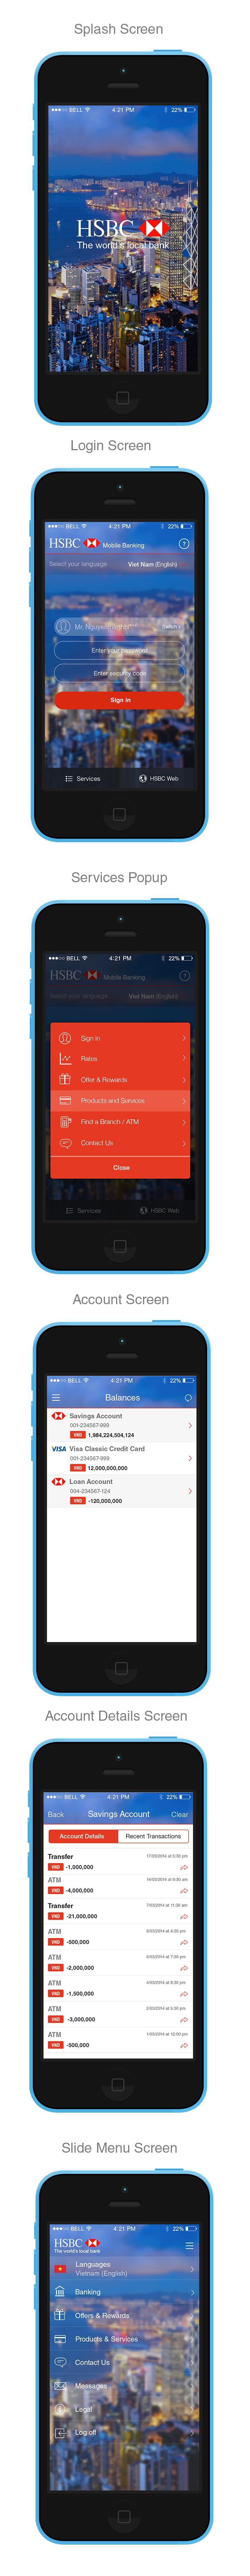 Try re-design for HSBC Mobile Banking App on Behance